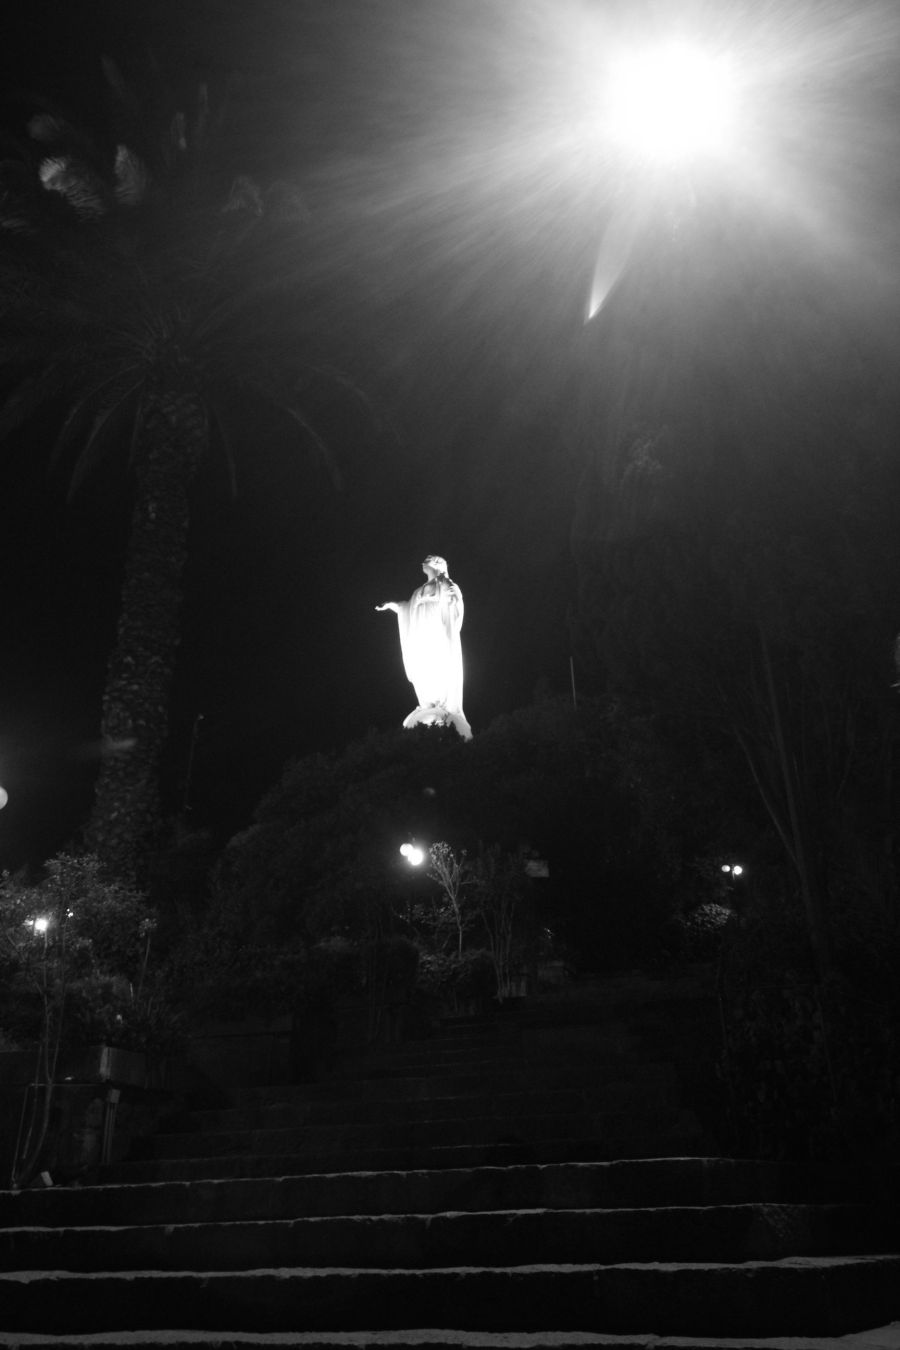 chile santiago san cristobal hill night time